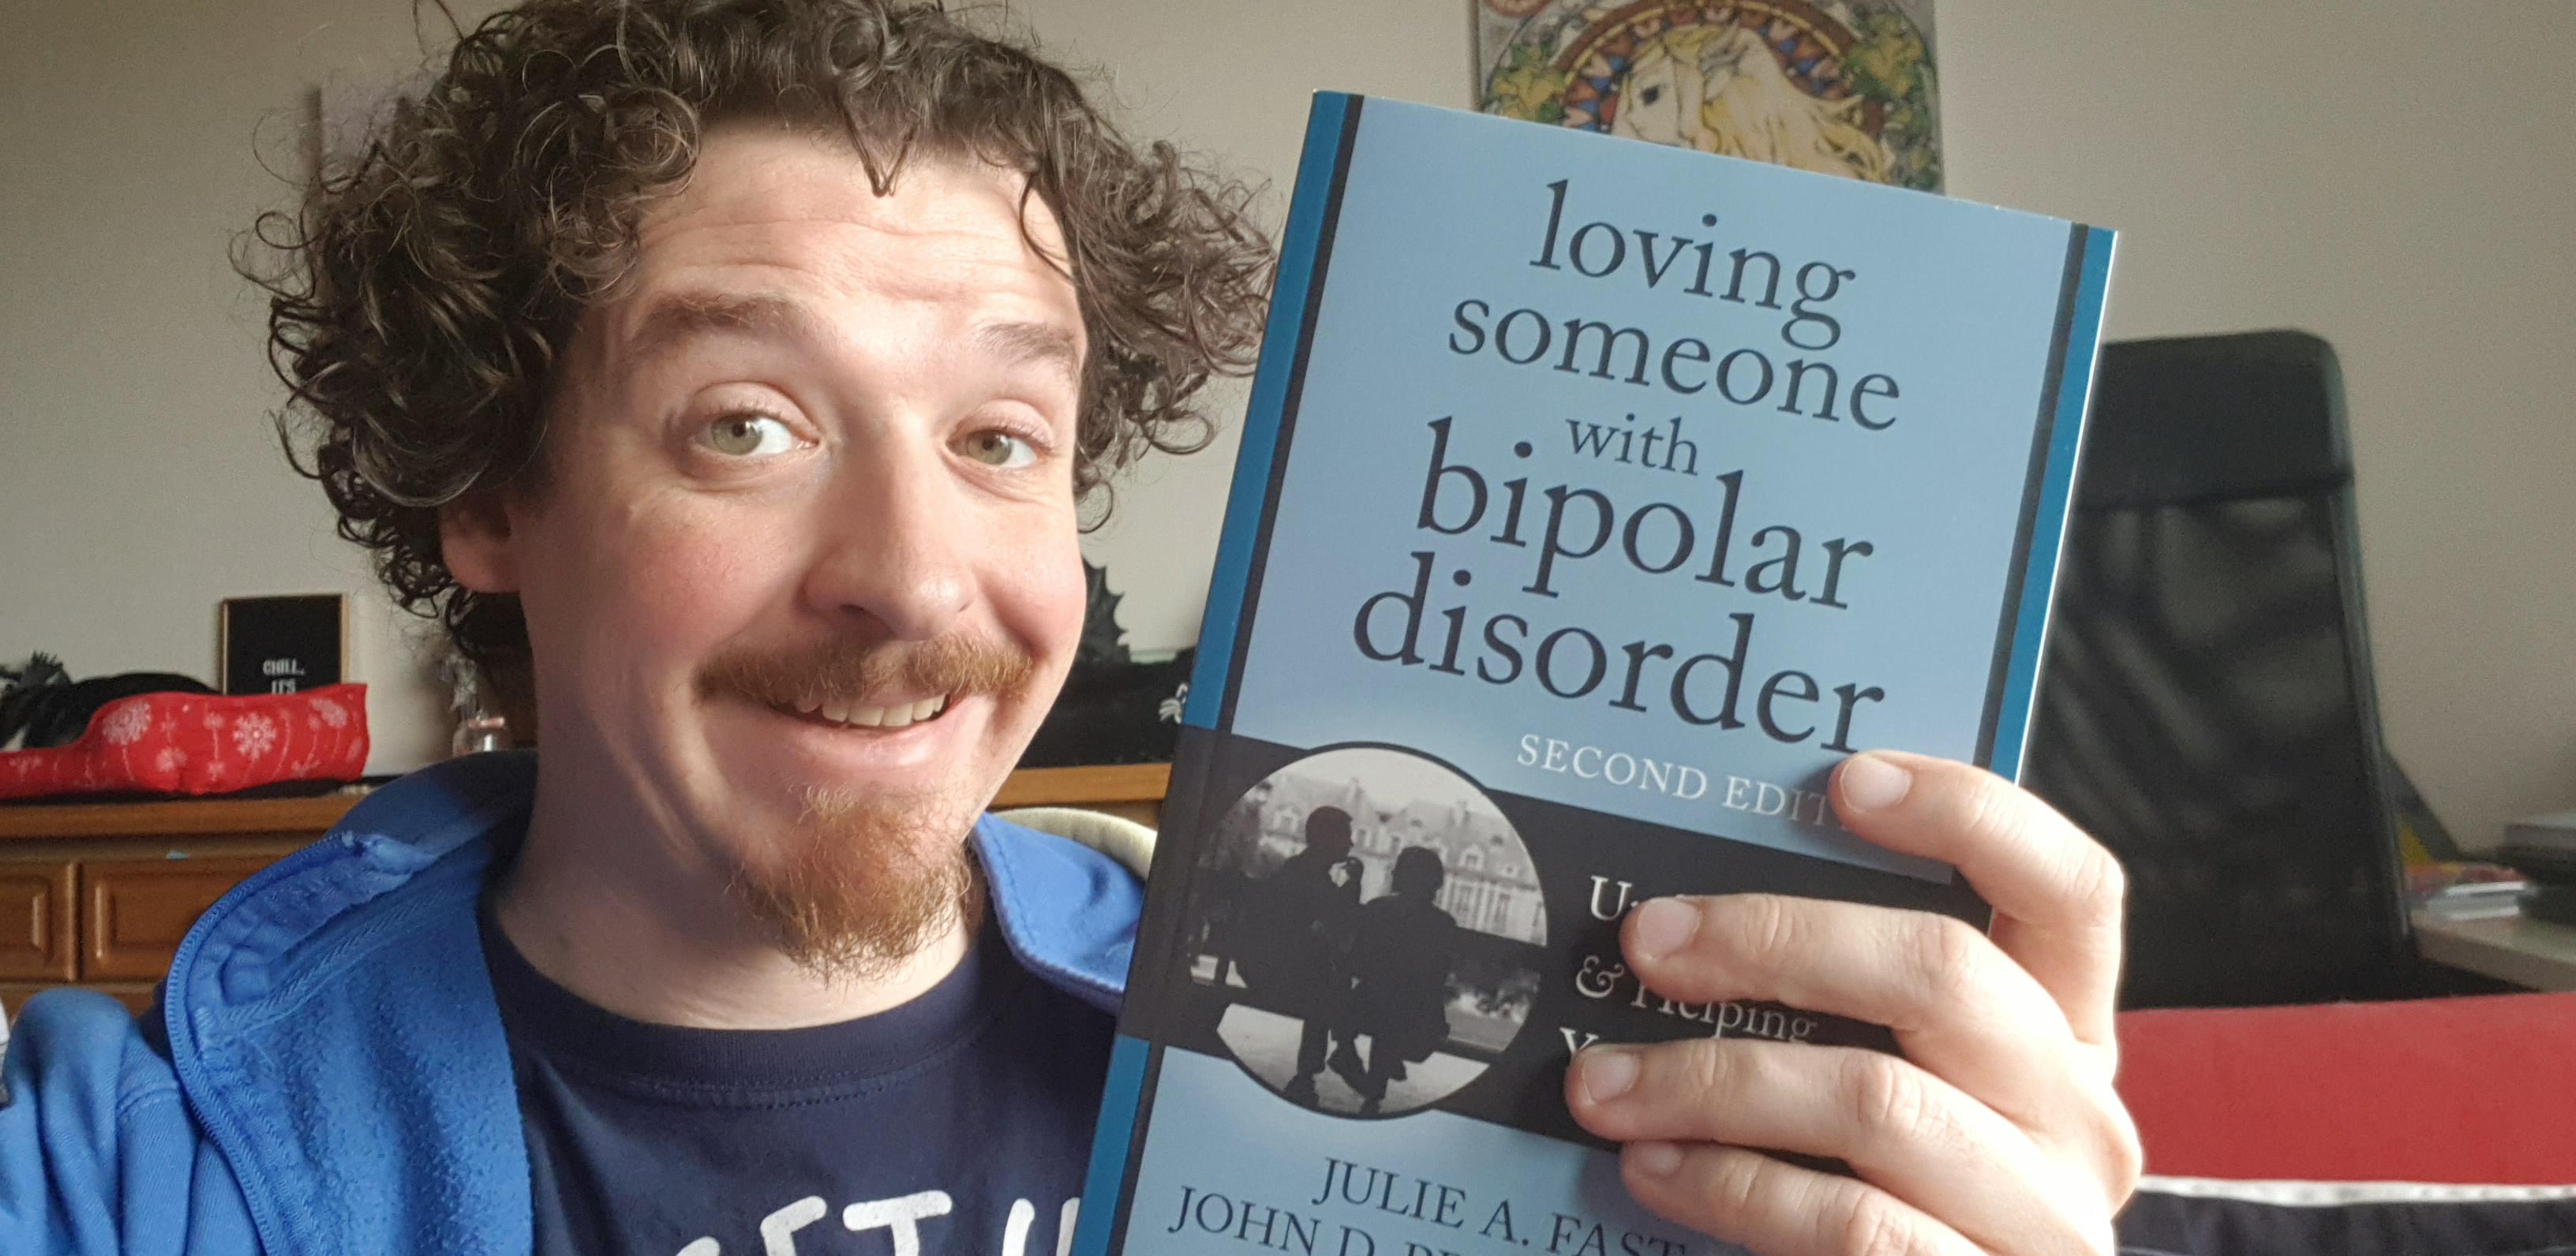 Loving Someone with Bipolar Disorder - 2